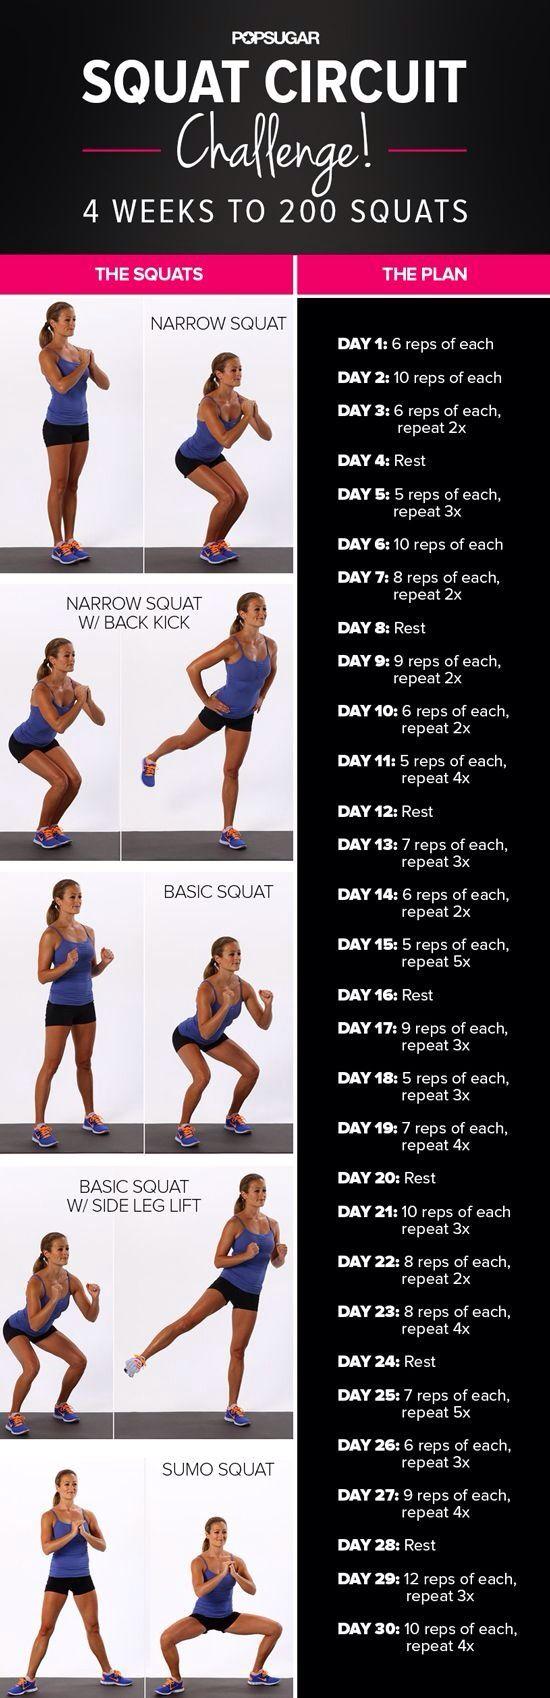 Squat challenge.